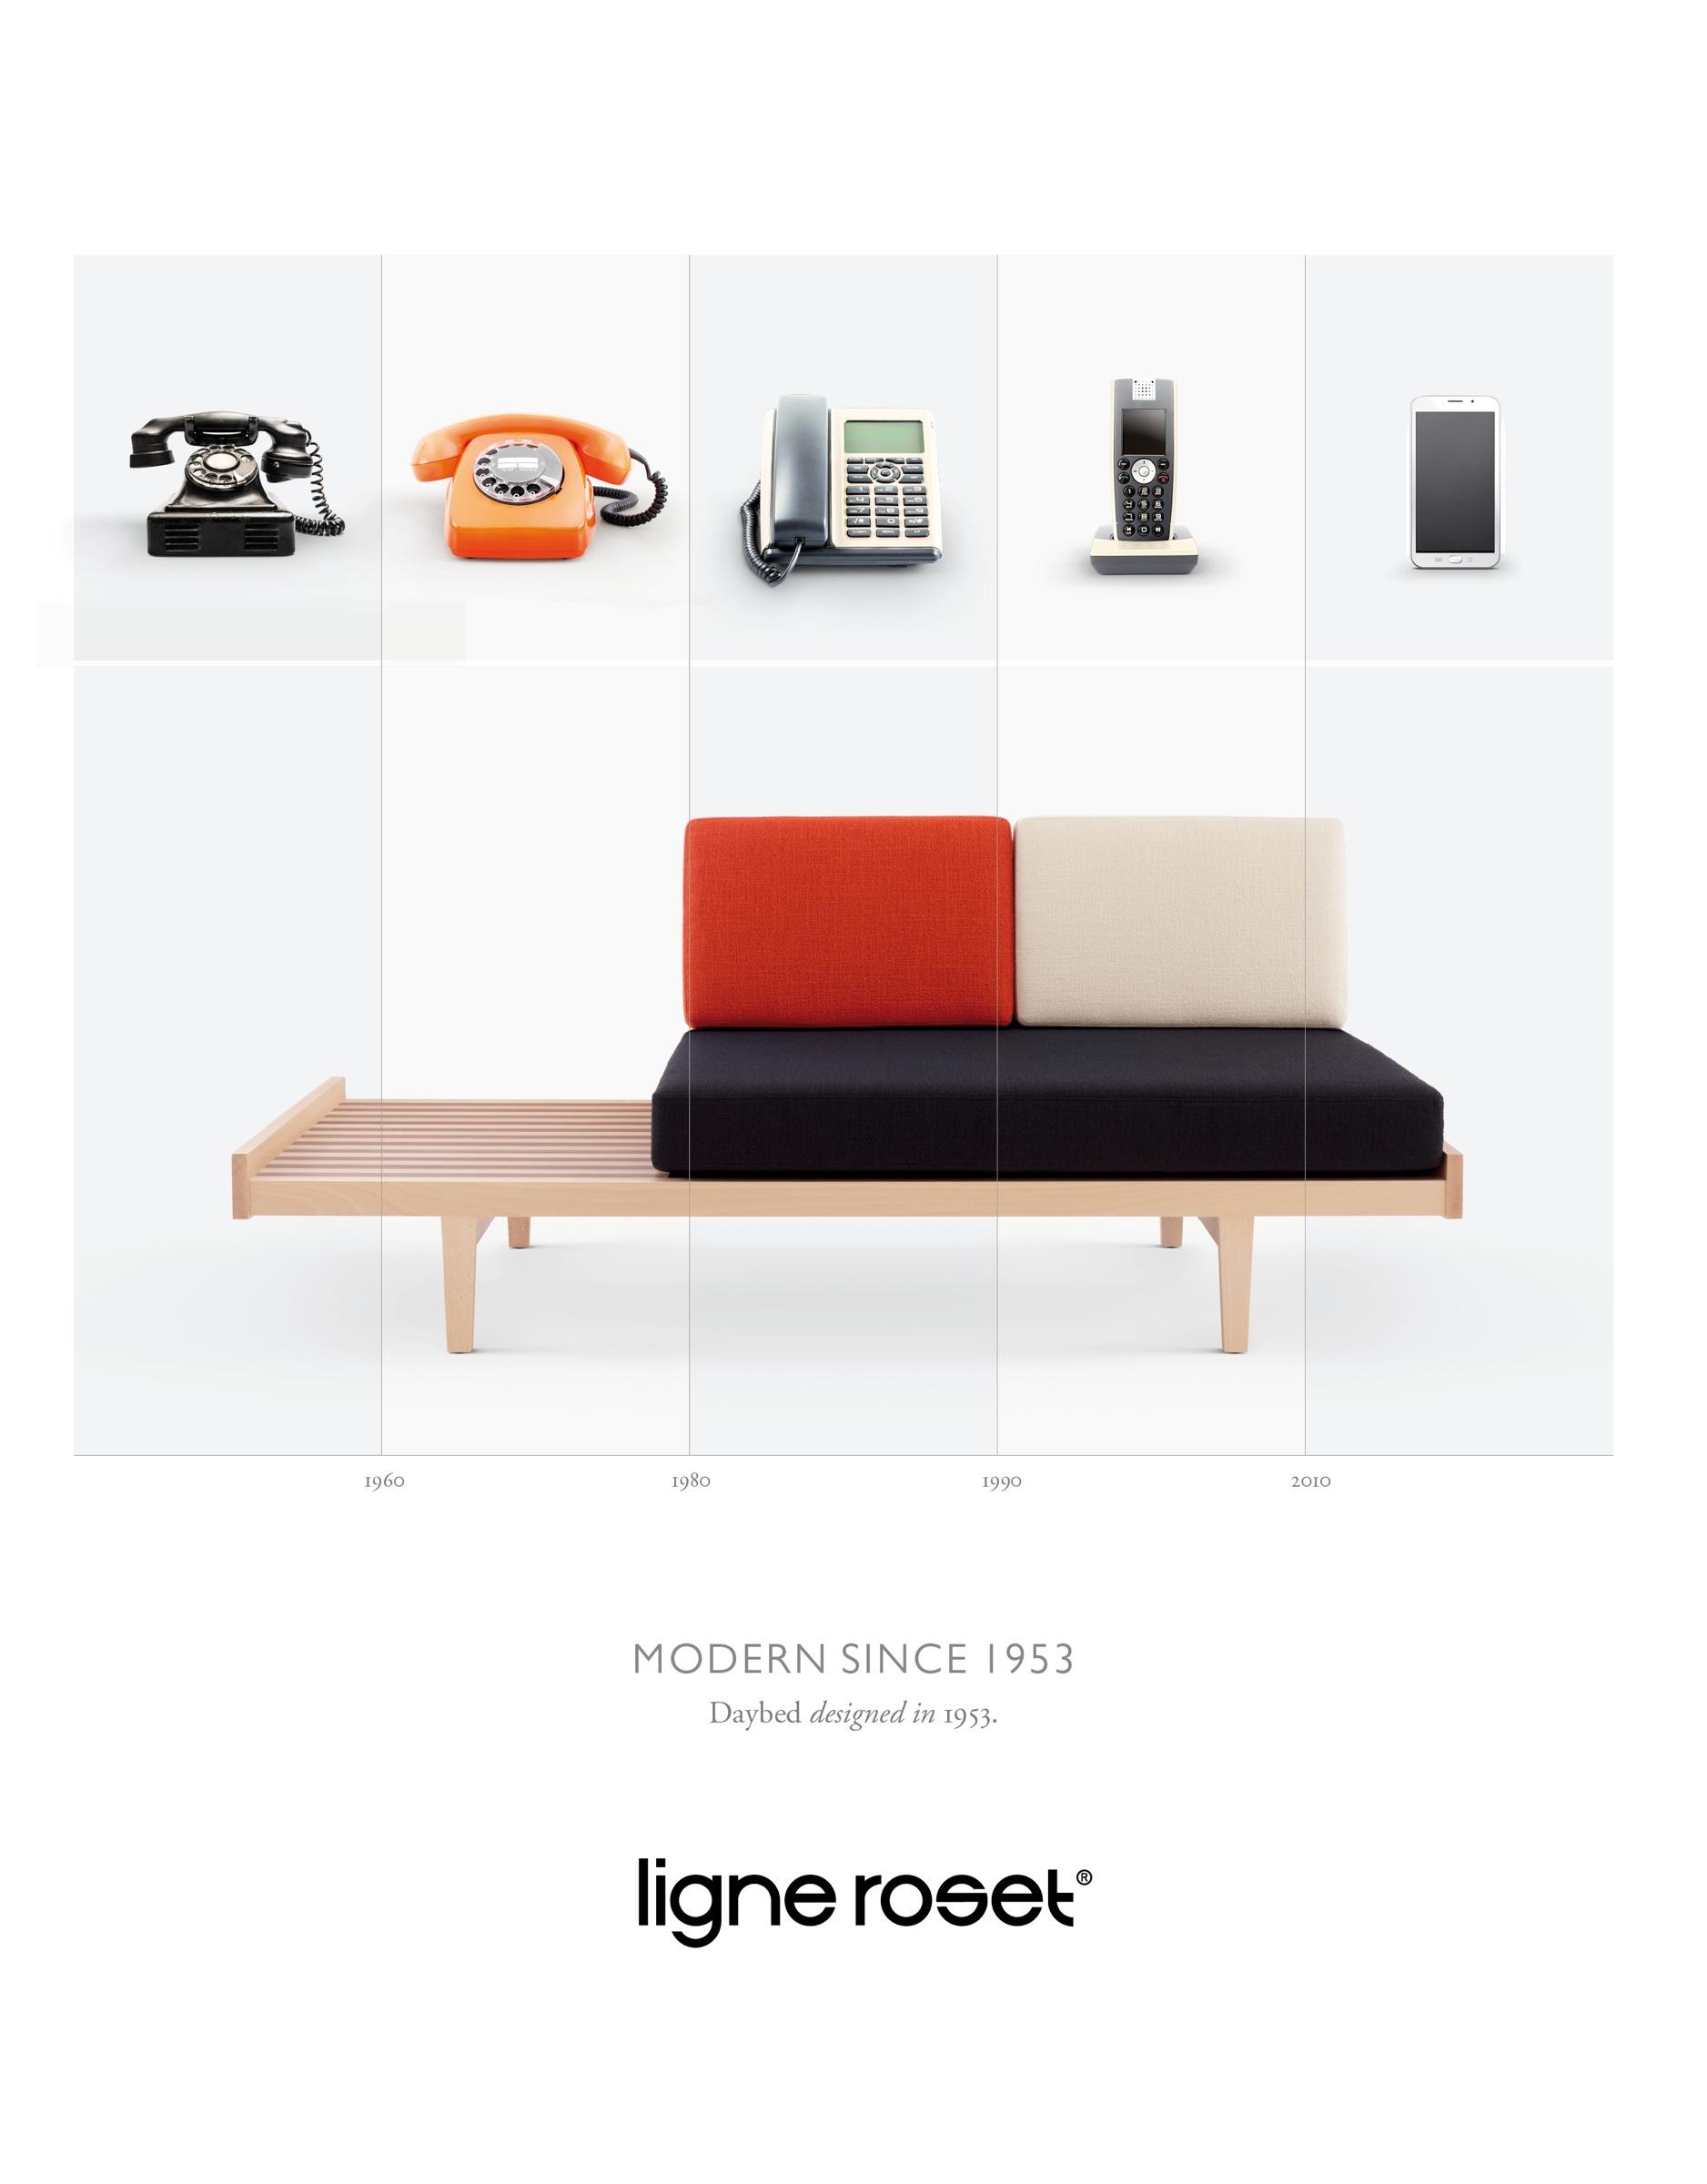 Ligne Roset Print Advert By Les Gaulois: Pierre Paulin Modern since ...